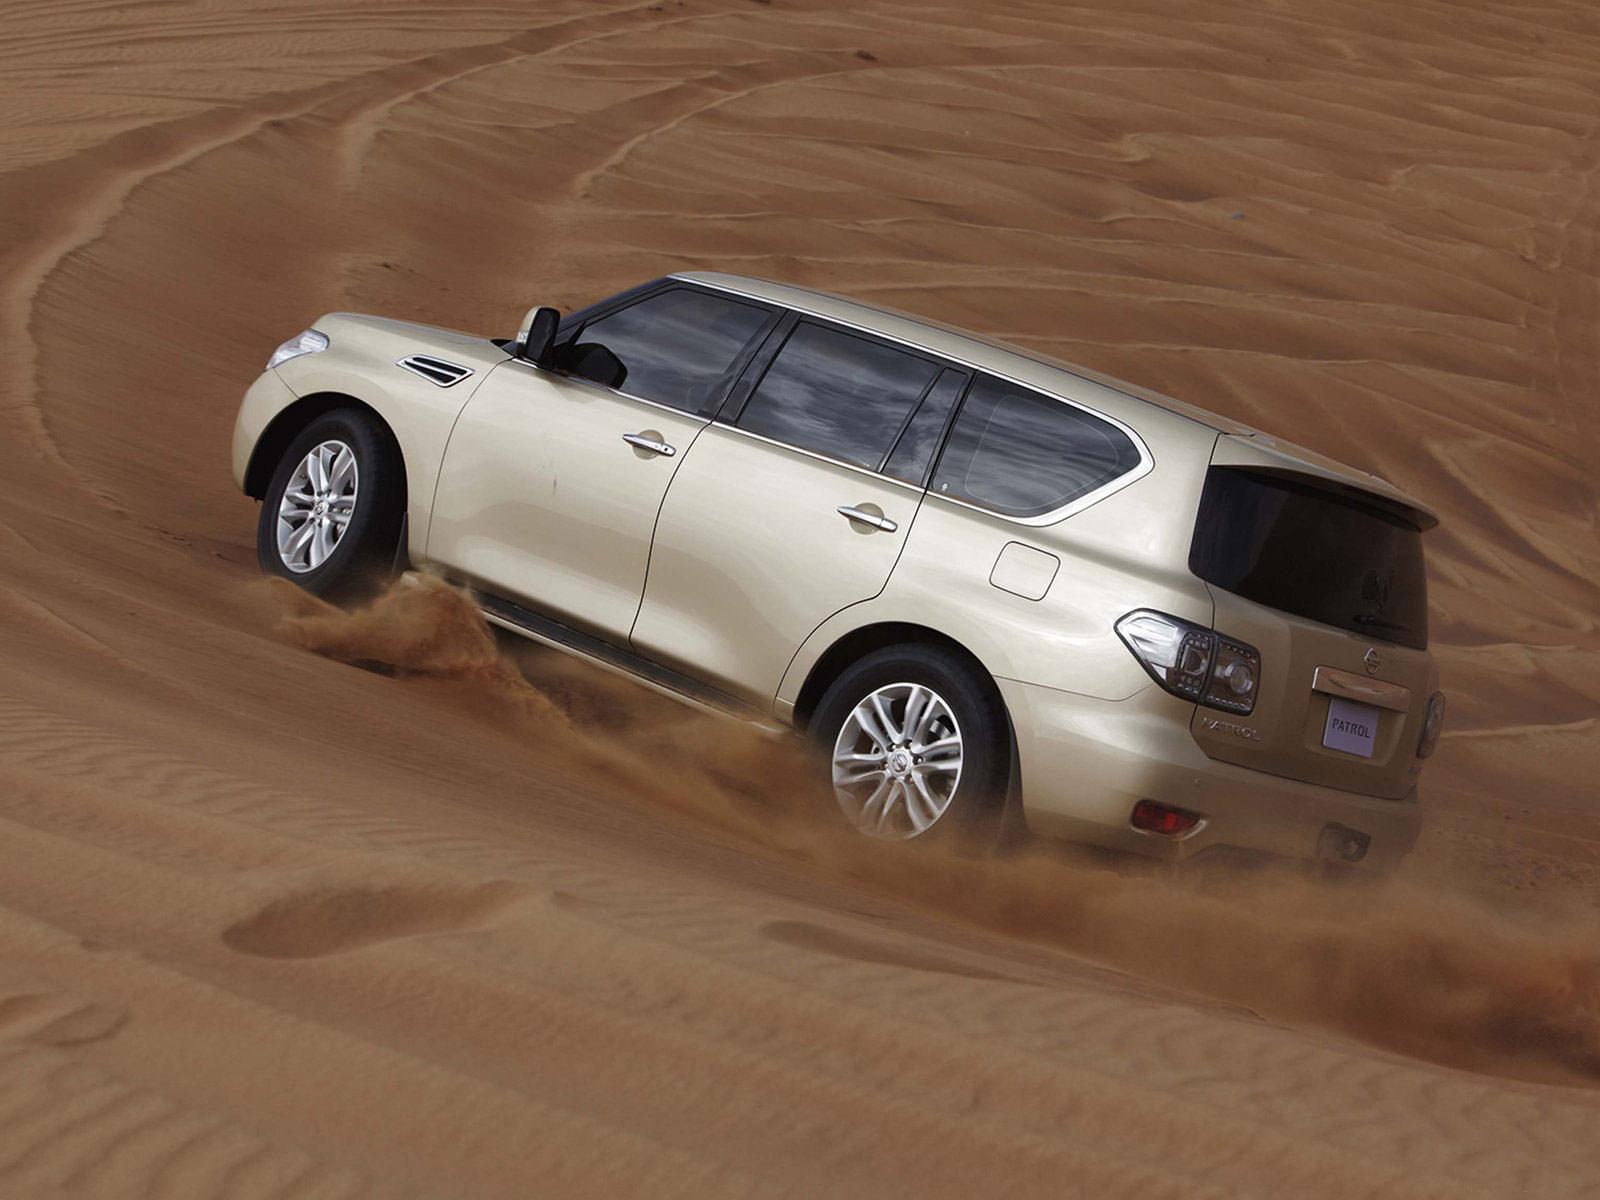 POWER VEHICLE. Modified Car.: NISSAN Patrol (2011)